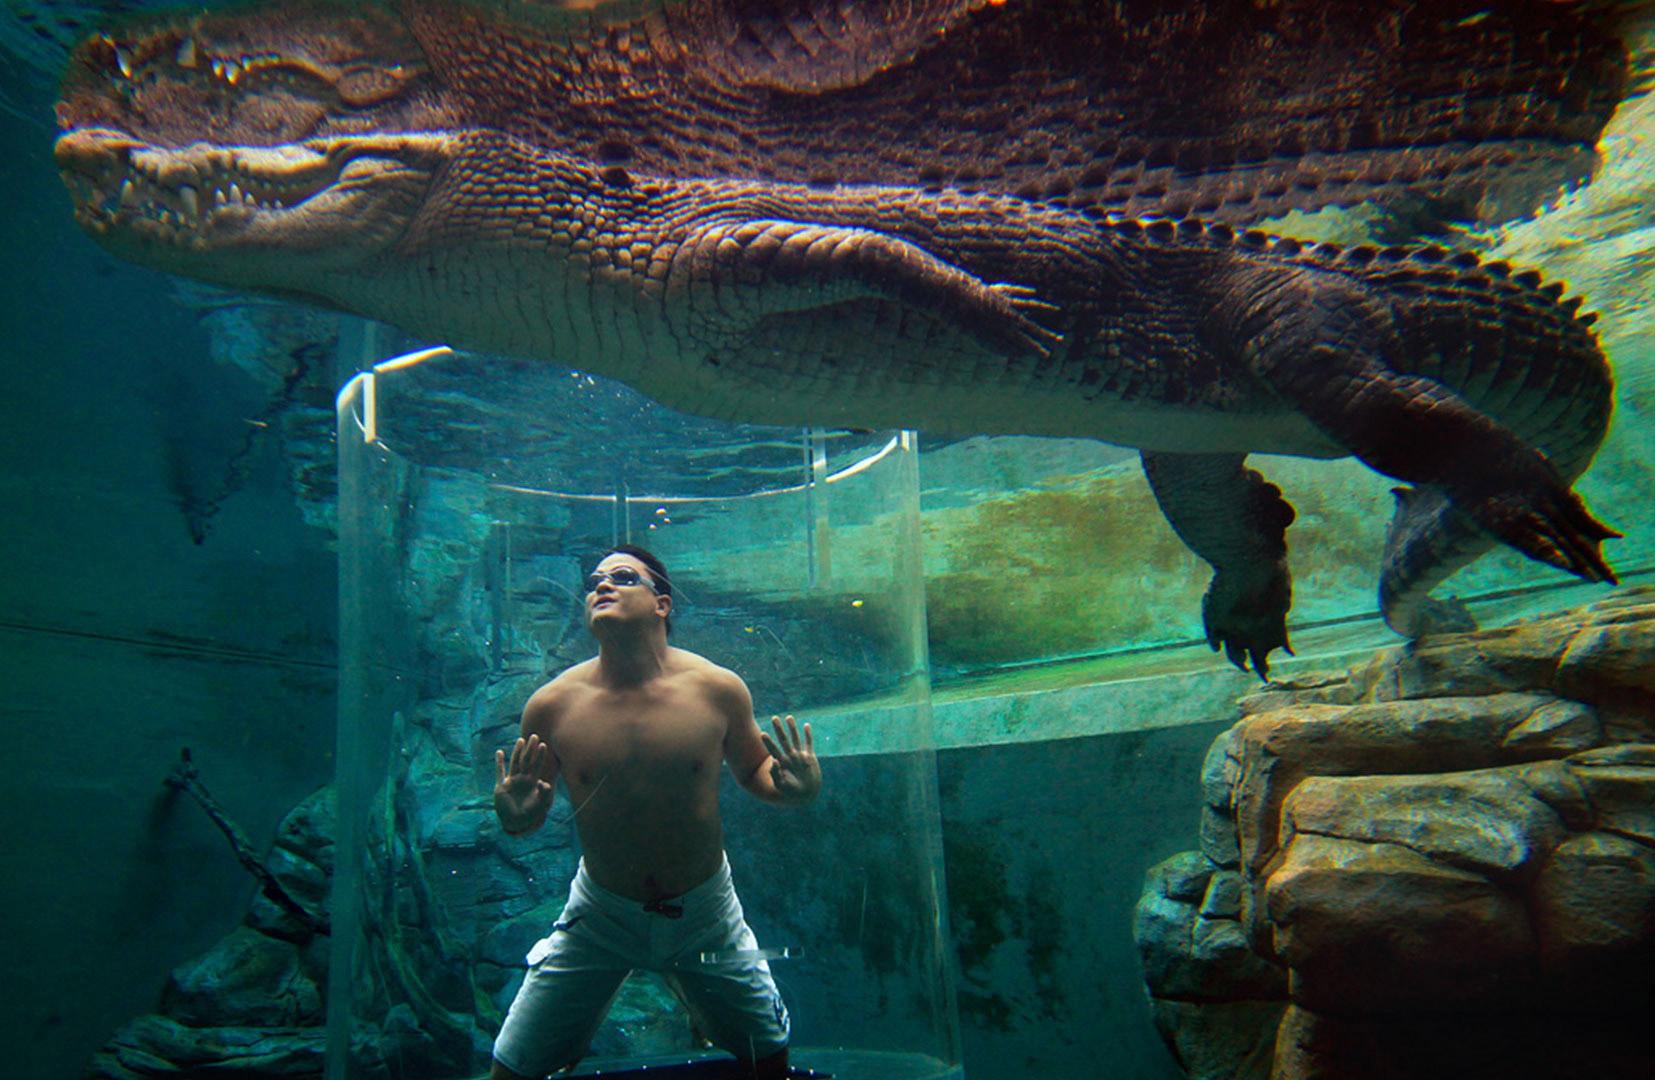 crocosaurus-cove--cage-of-death-01